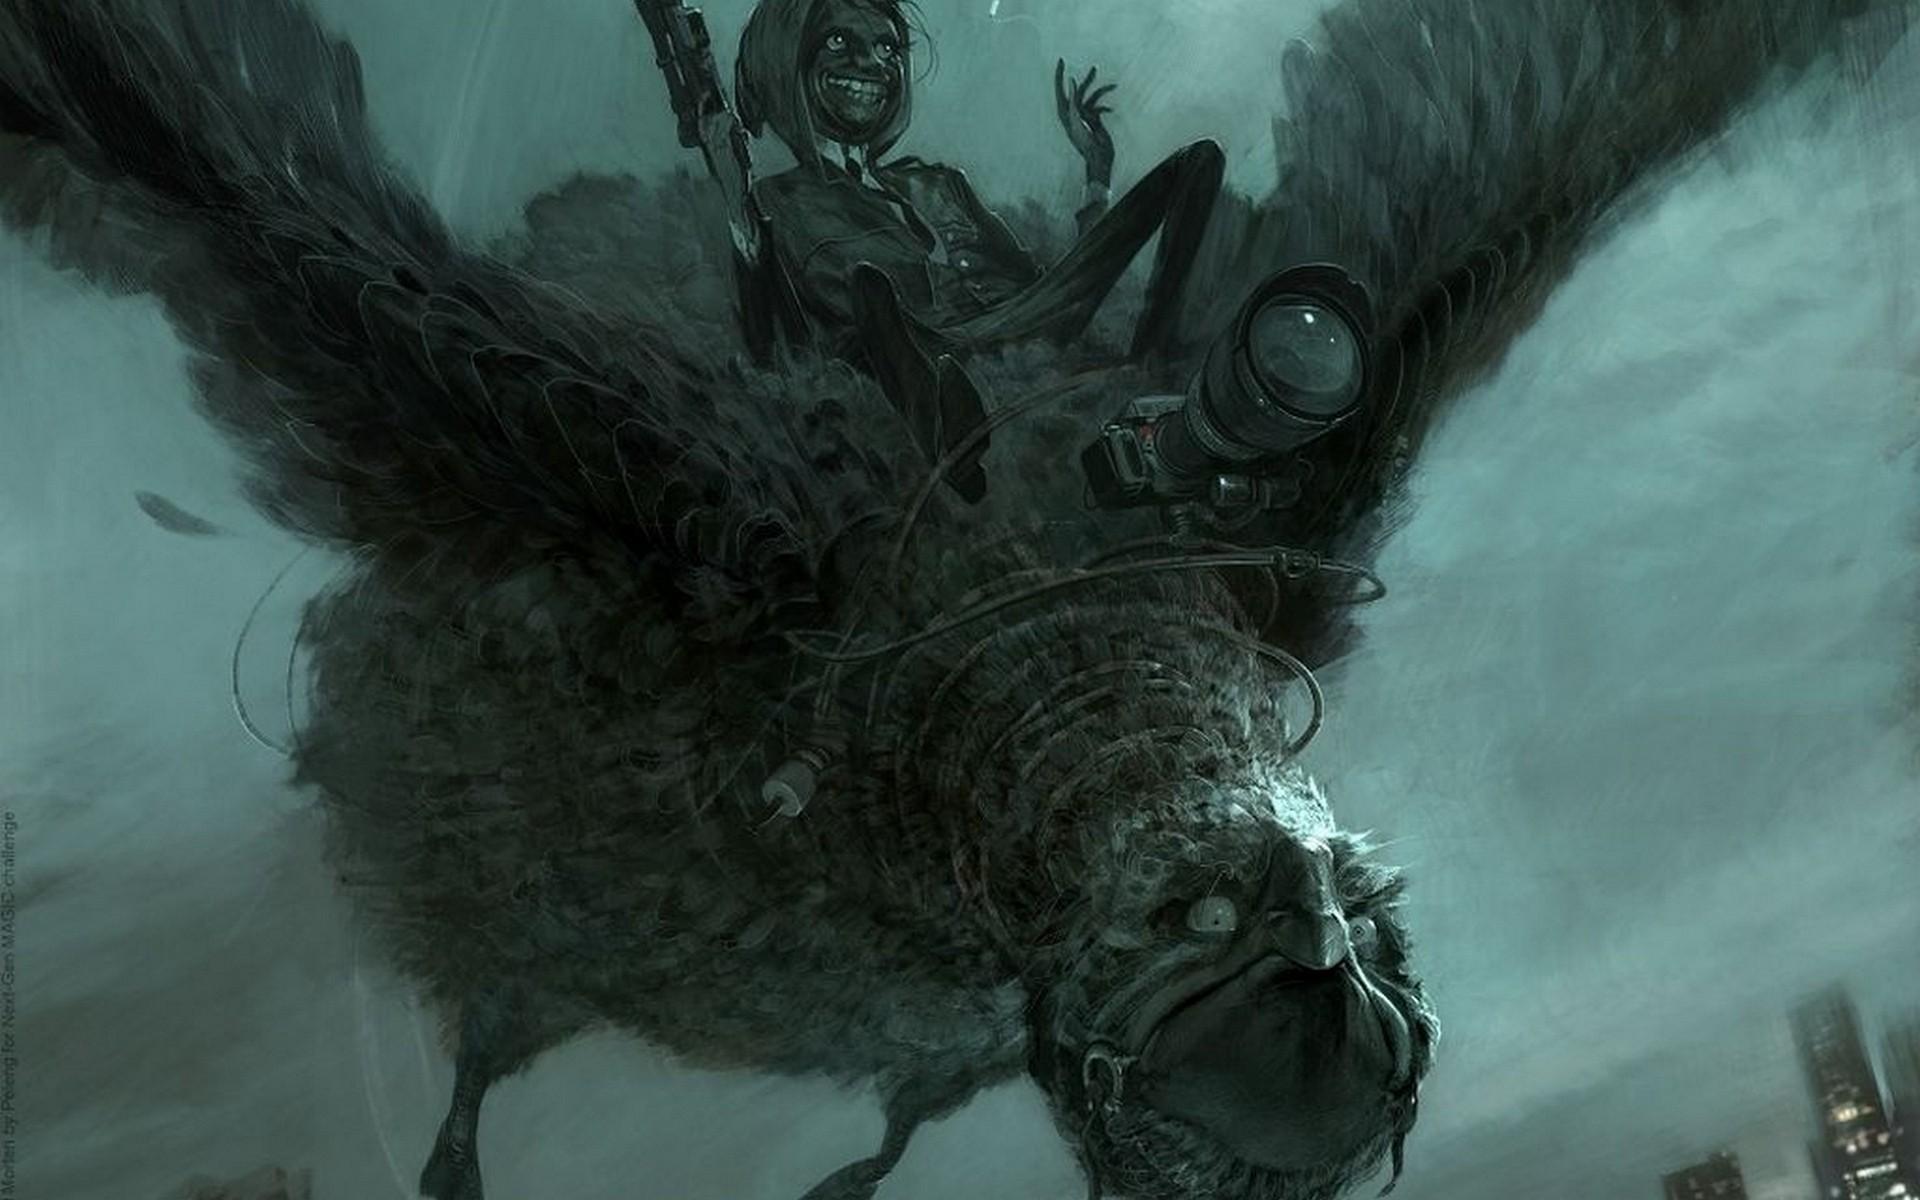 Creepy Wallpaper   Dark – Creepy Wallpaper   Just what you see here    Pinterest   Wallpaper